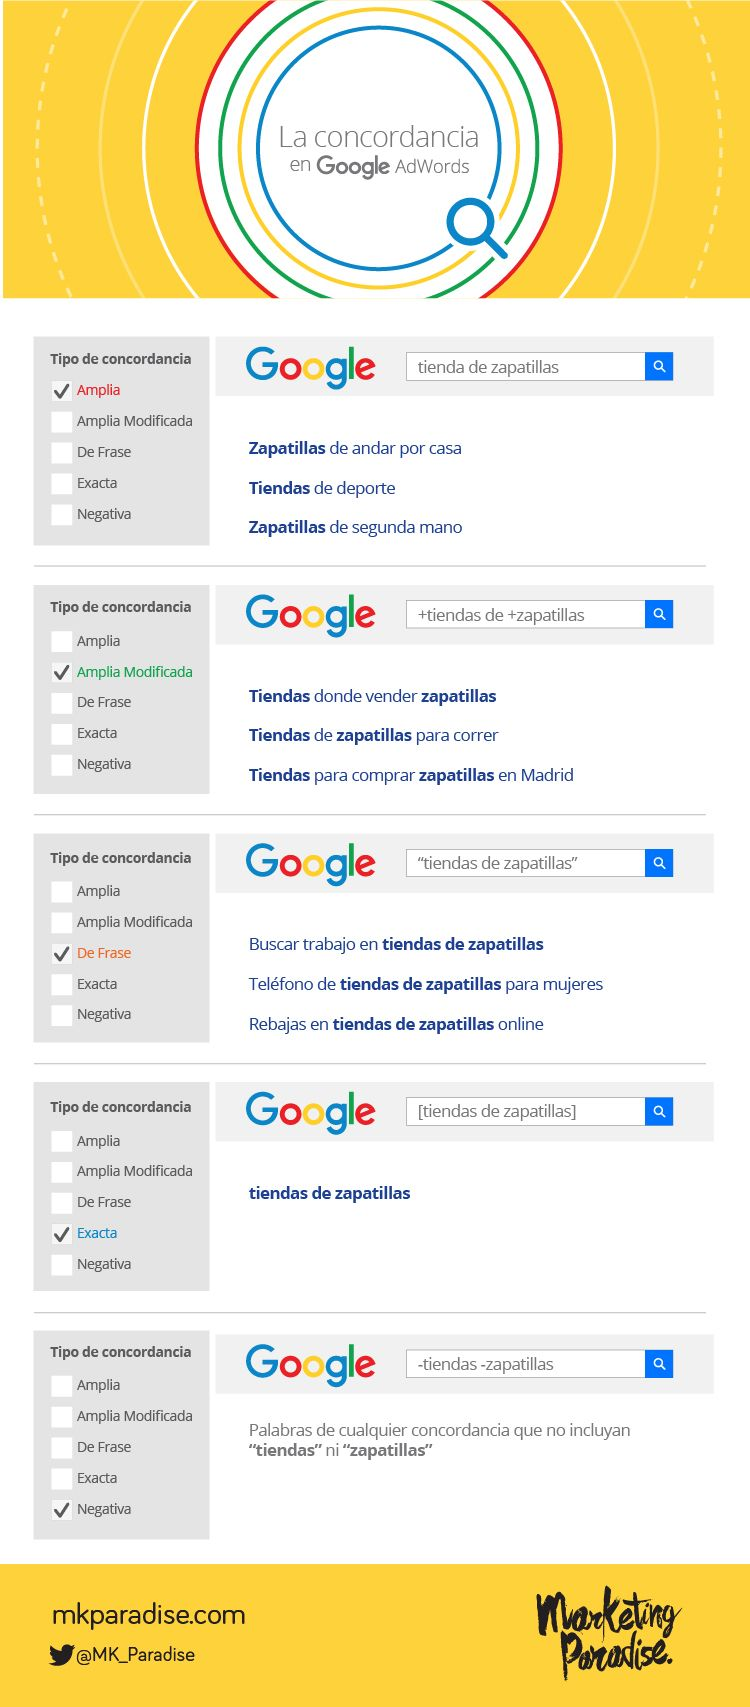 Castiga bani cu google adwords яндекс директ цена клика в москве и регионах